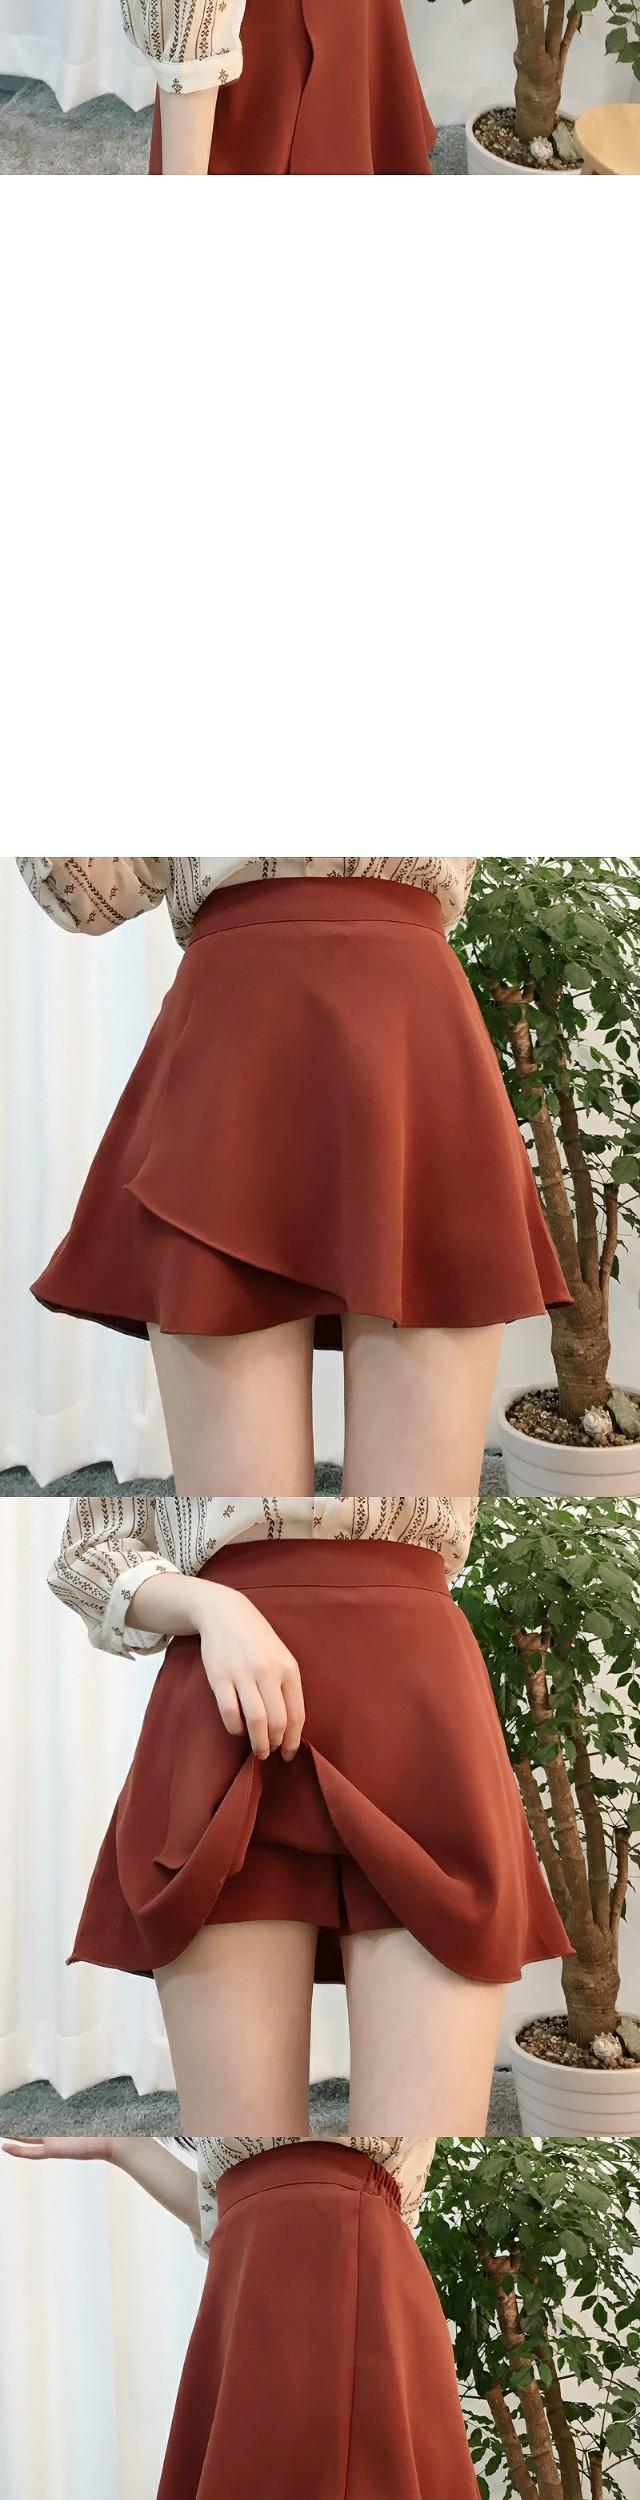 Life Fit Furea Skirt Pants